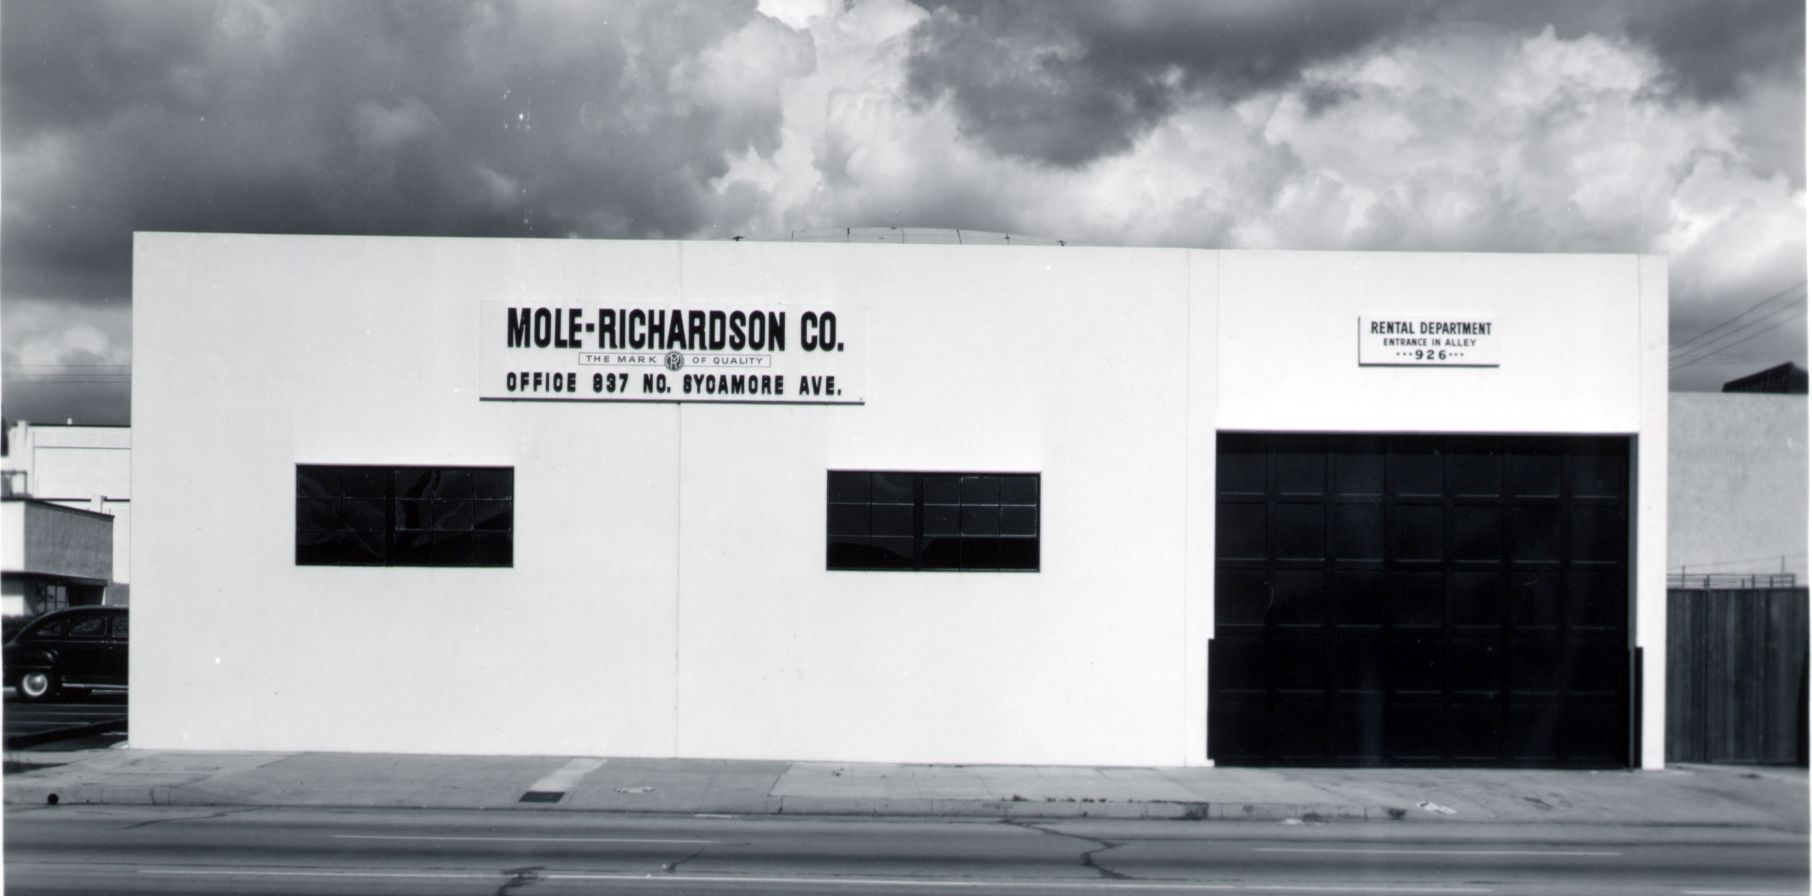 Molerichardson co rentals building